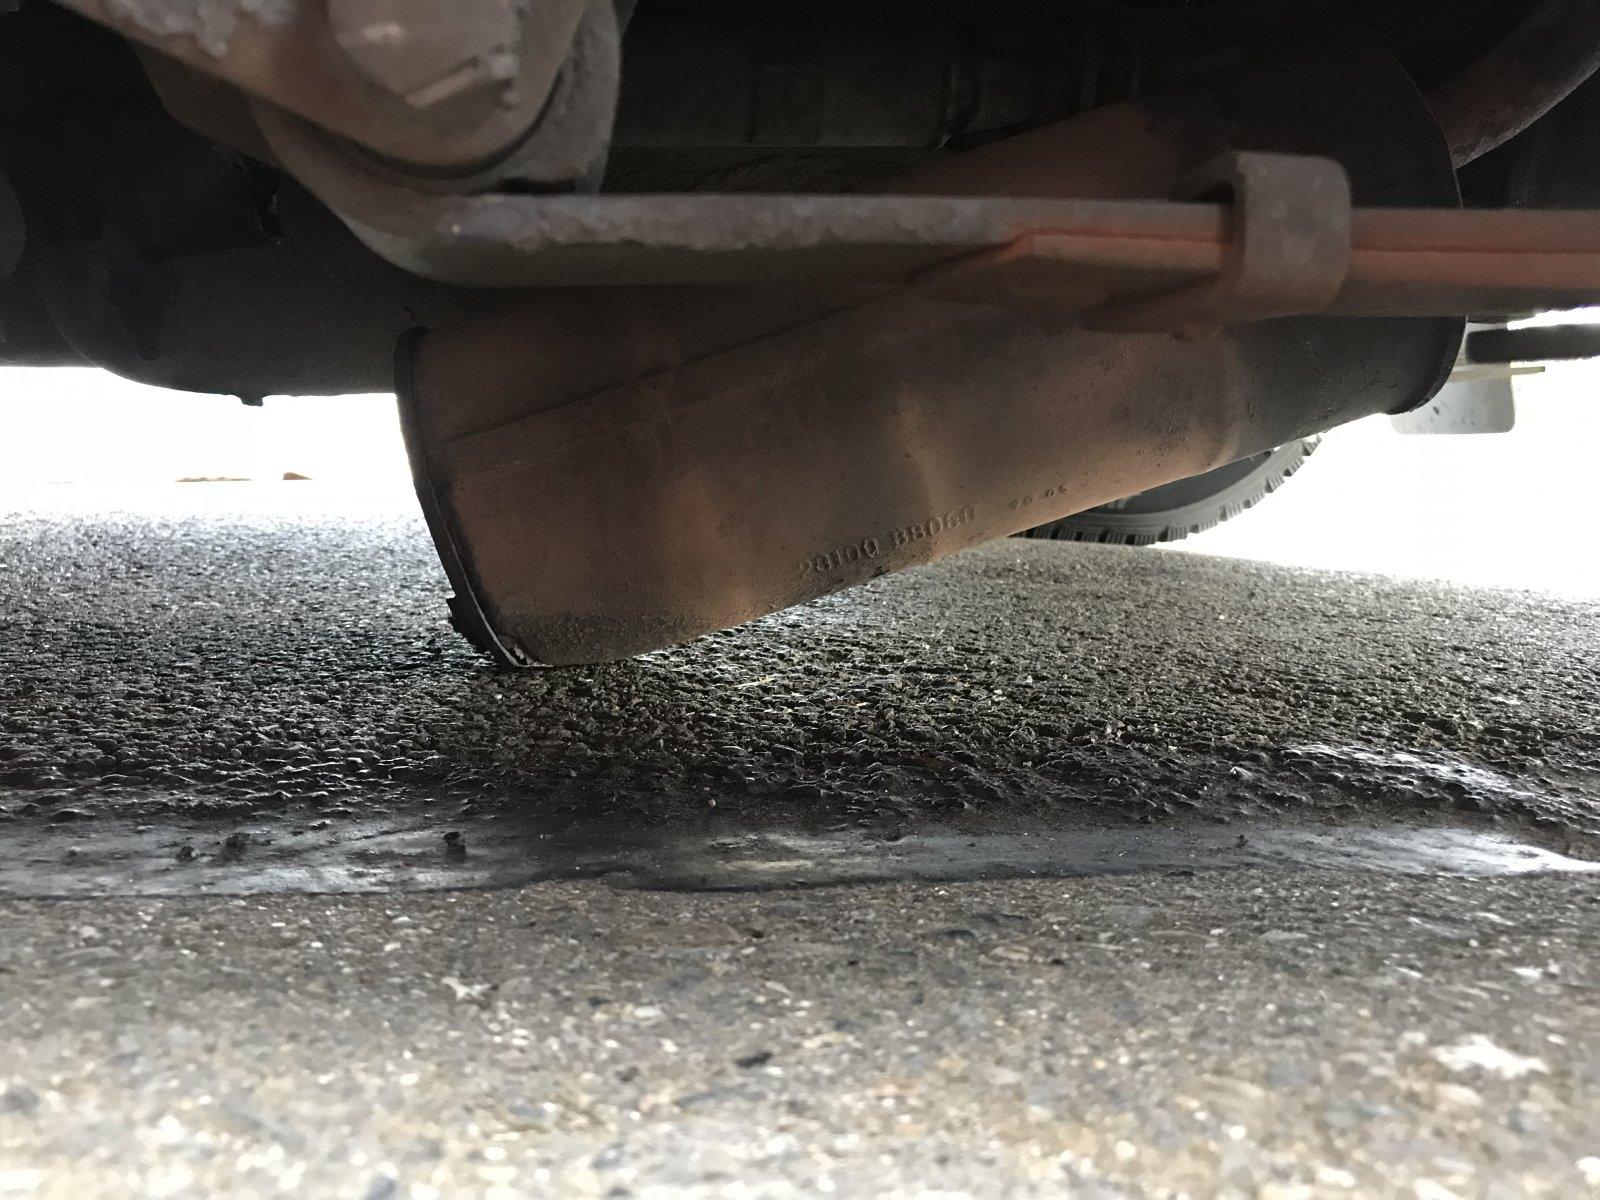 09042018 bruiser exhaust (1).JPG